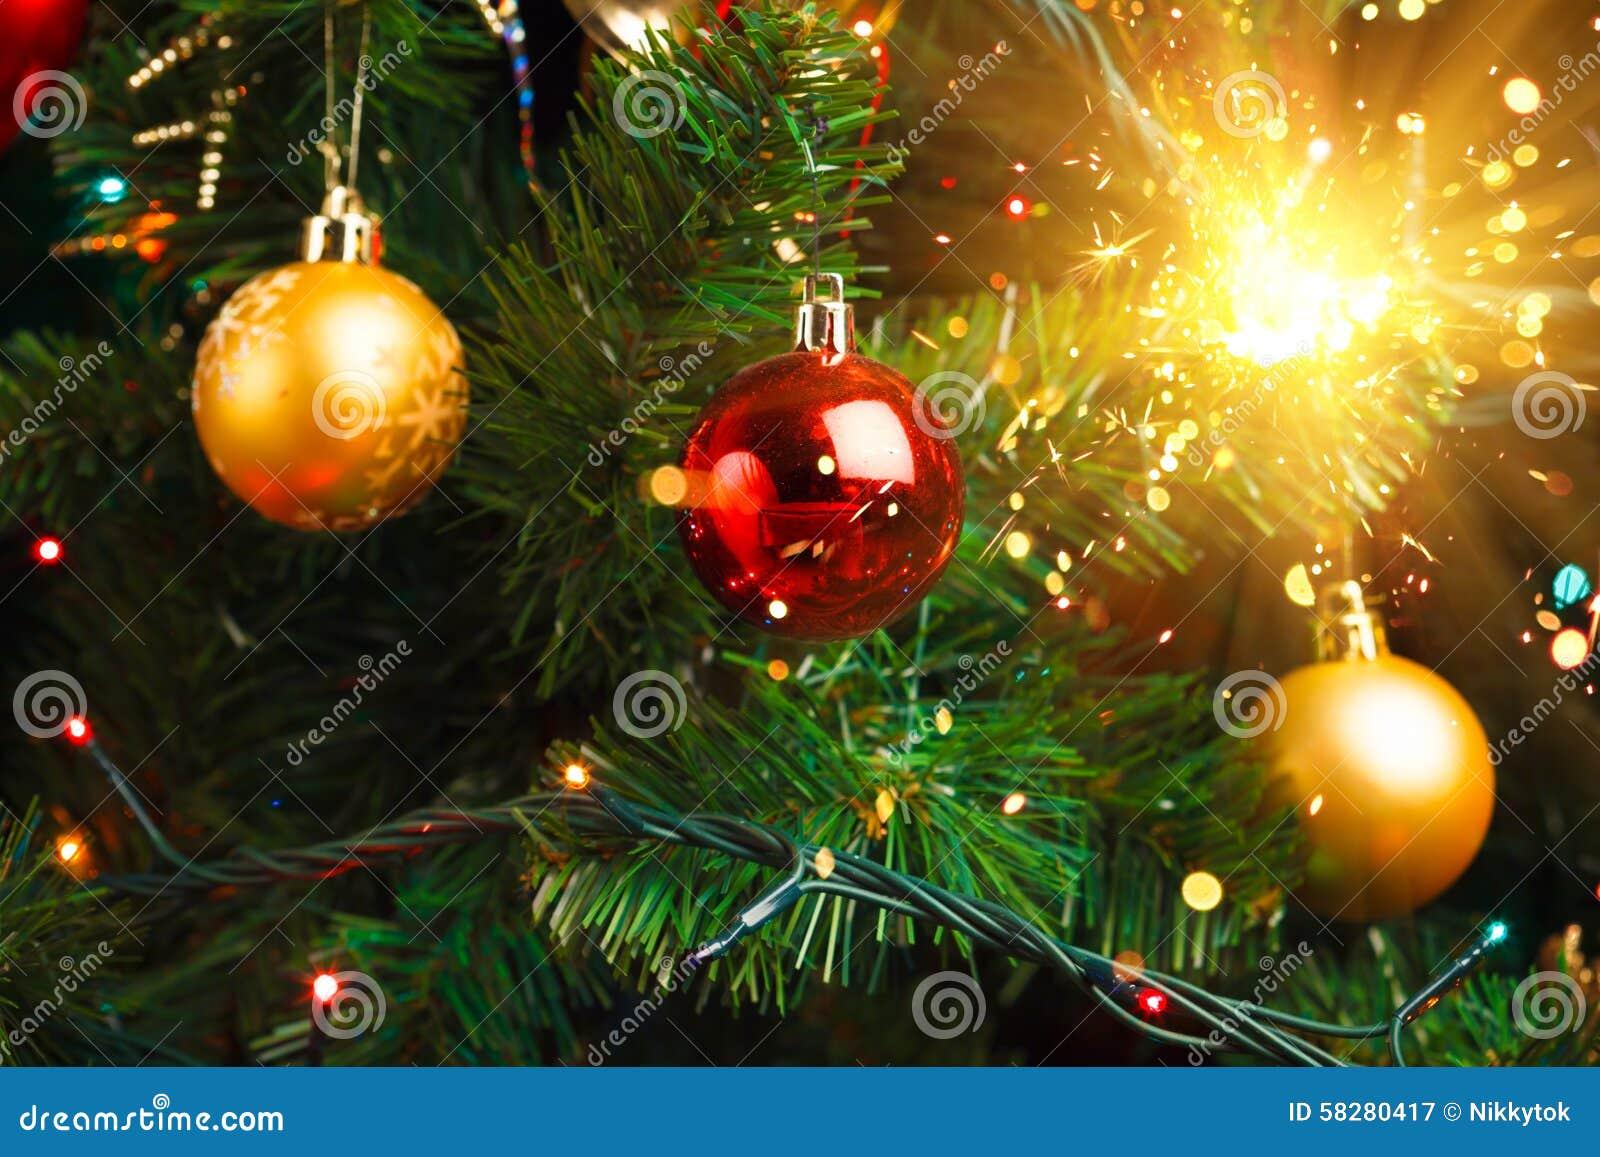 #C22609 Christmas Tree Decoration With Shiny Sparkler Stock Photo  6361 décoration noel commerce 1300x957 px @ aertt.com